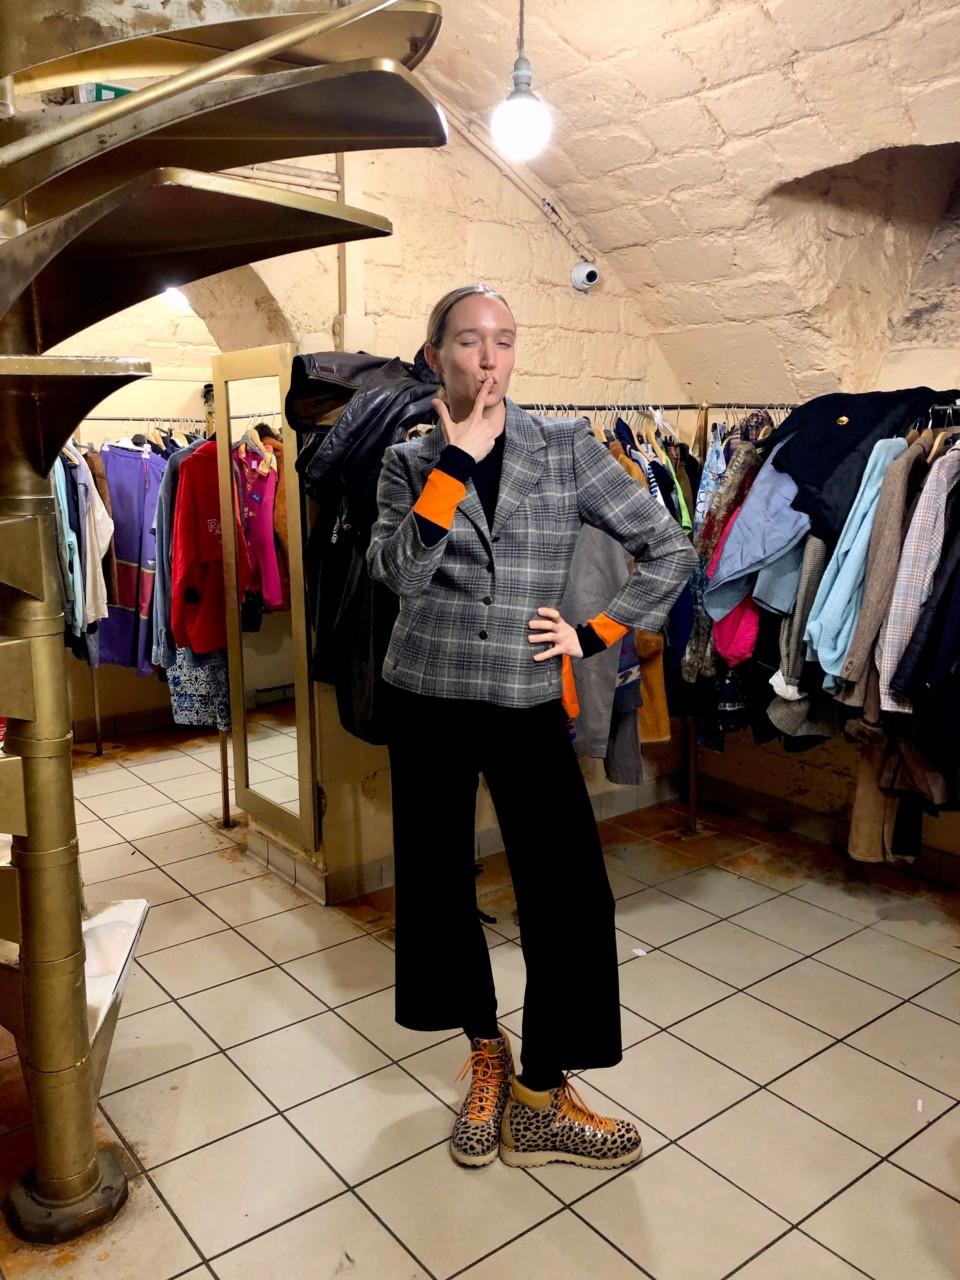 marianne-haugli-freep-star-vintage-shopping-fashion